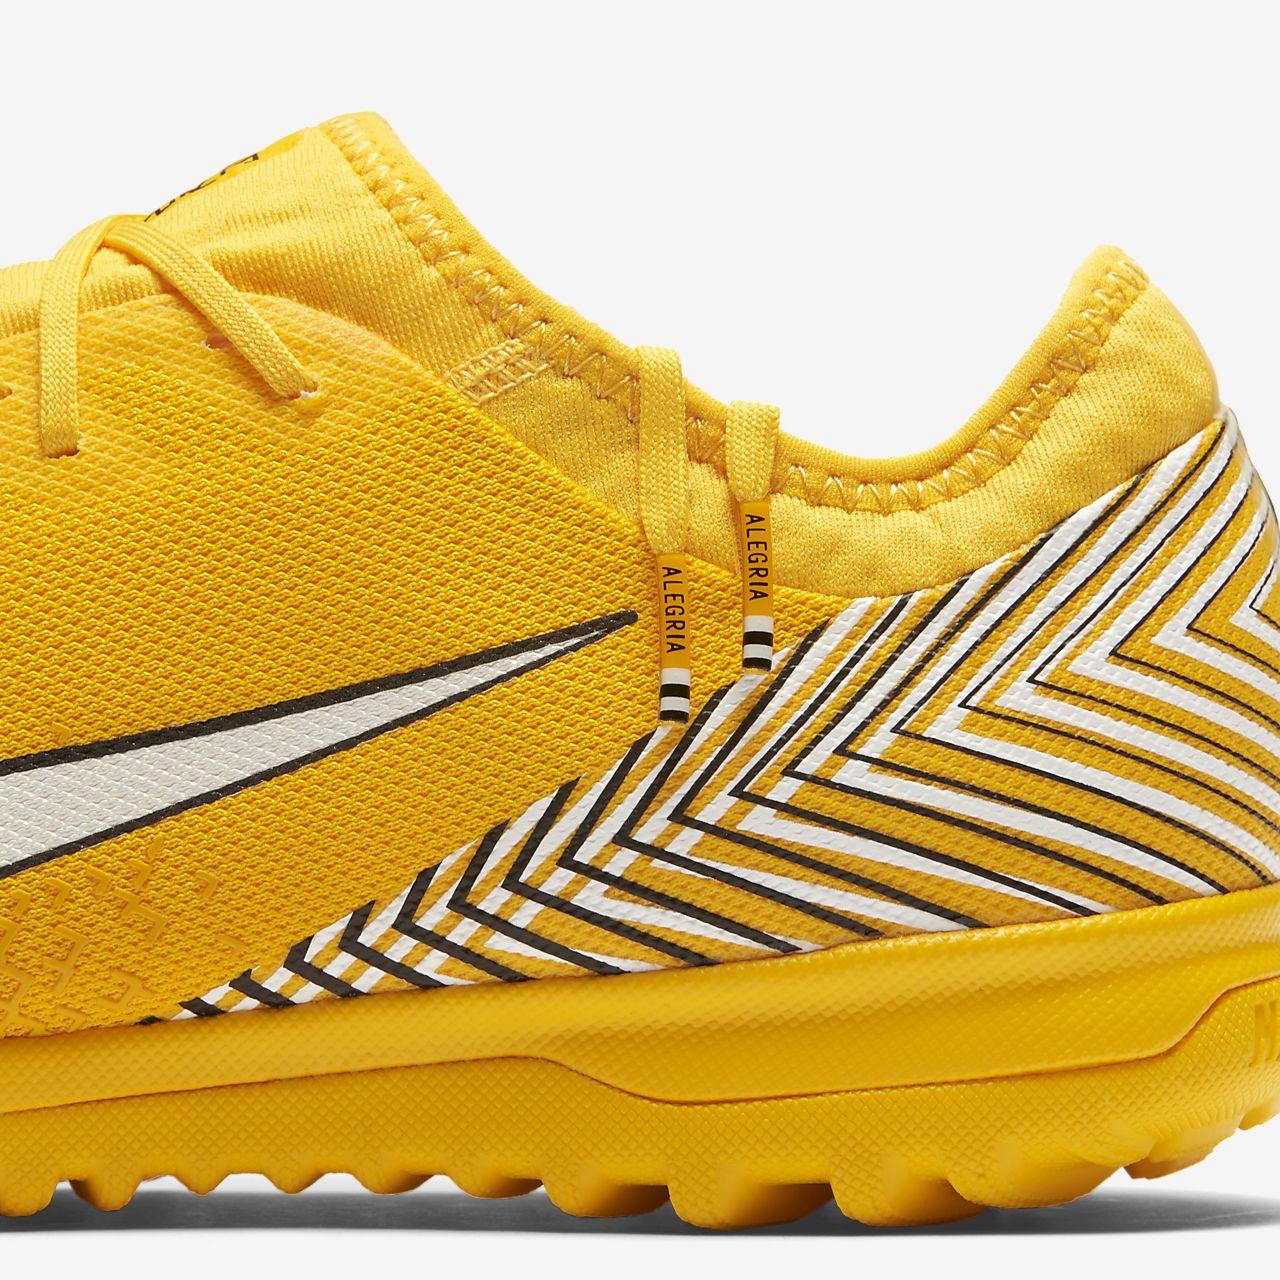 Nike Mercurial Vapor XII Pro Neymar Jr Fußballschuh für Kunstrasen